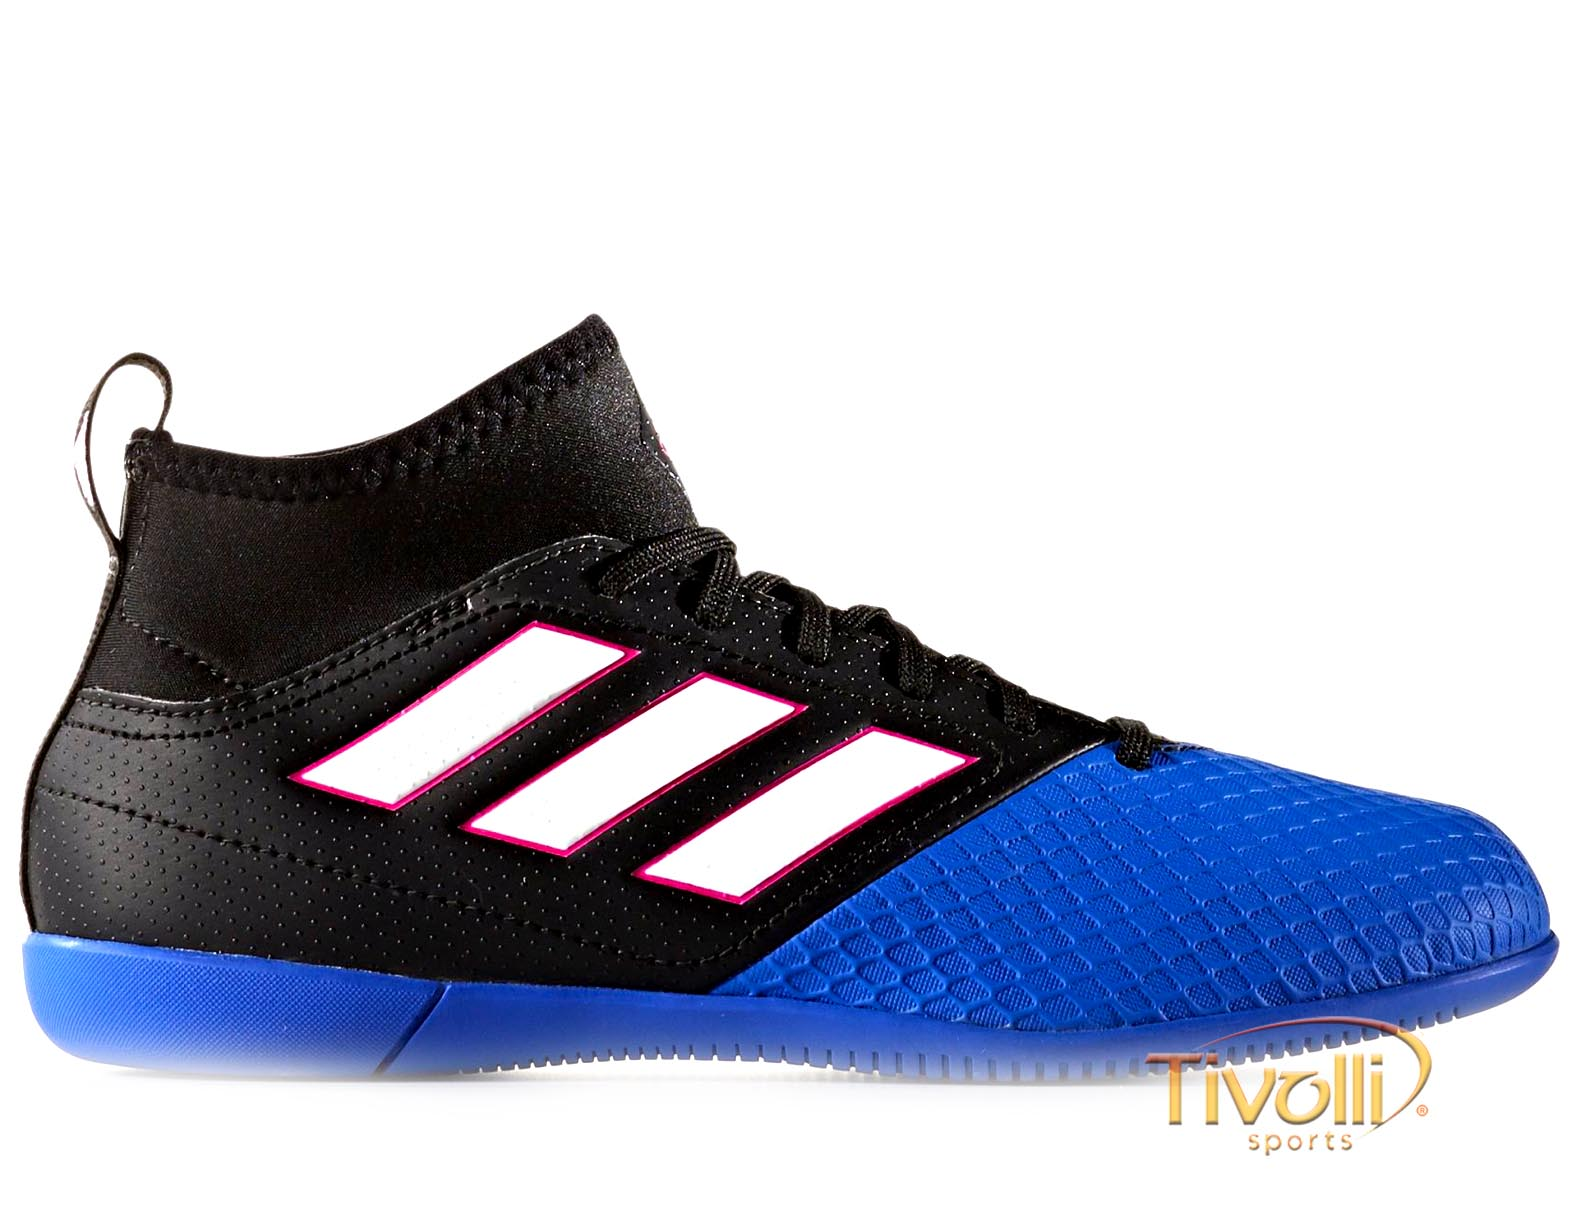 c793c1e982 Chuteira Adidas Ace 16.3 IC PRIMEMESH Futsal Infantil   Preta